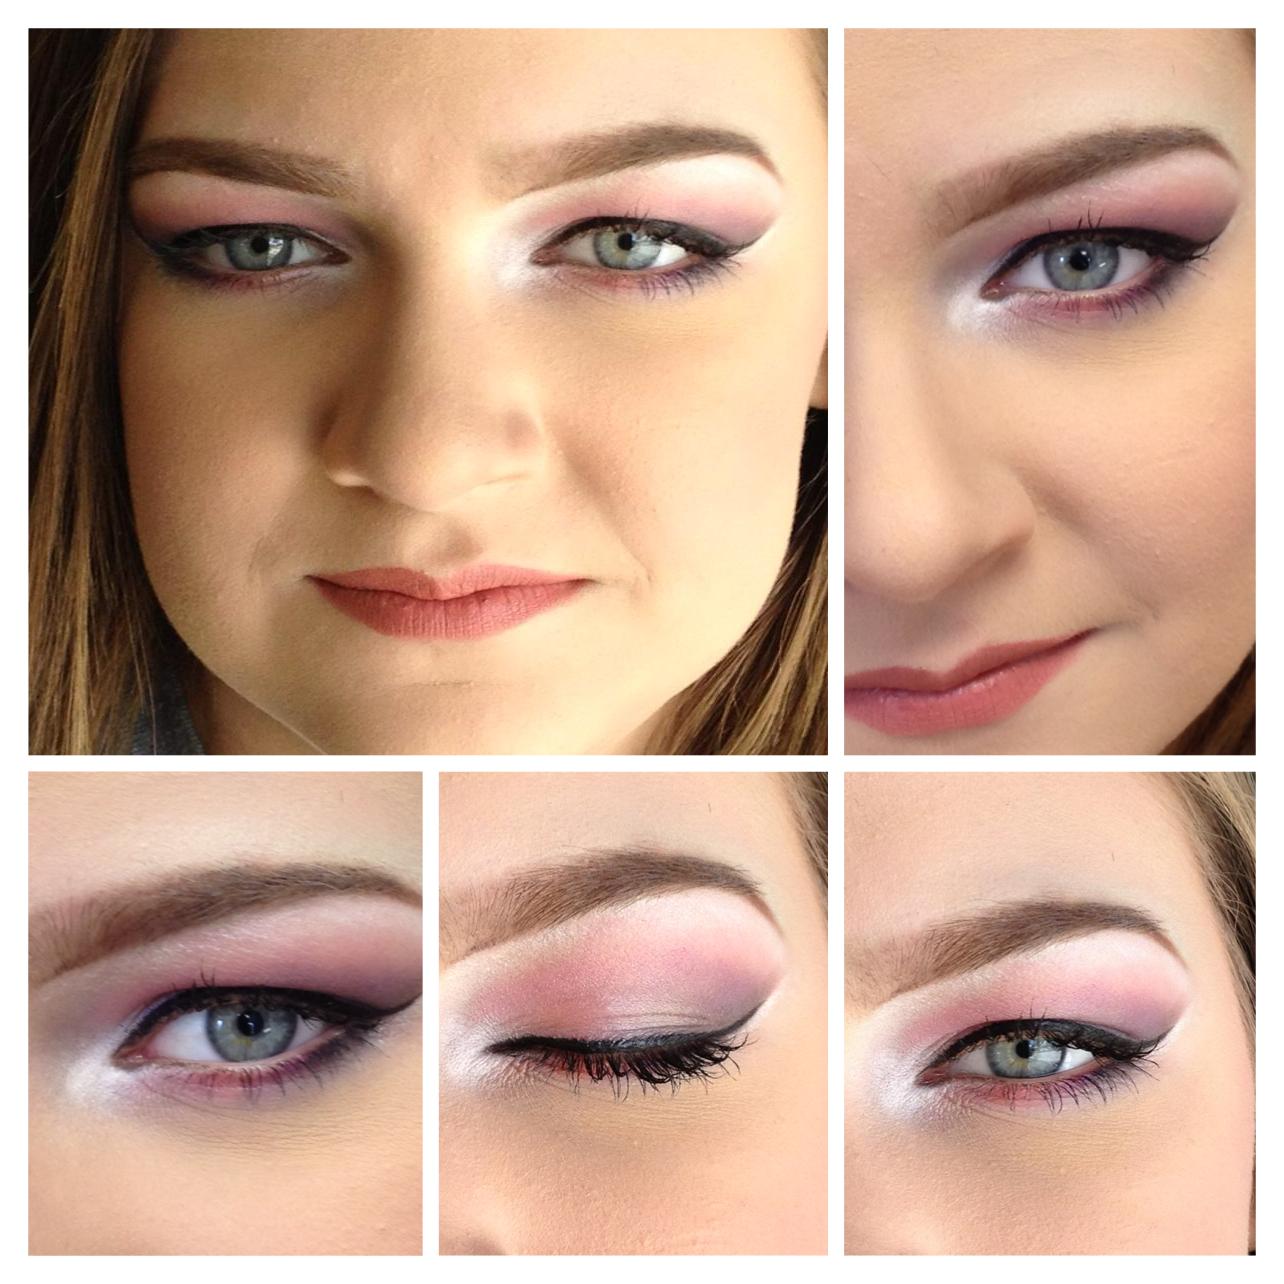 Pin By Merle Norman Cosmetics Hallsvi On Merle Girls Makeup Hallsville Cosmetics